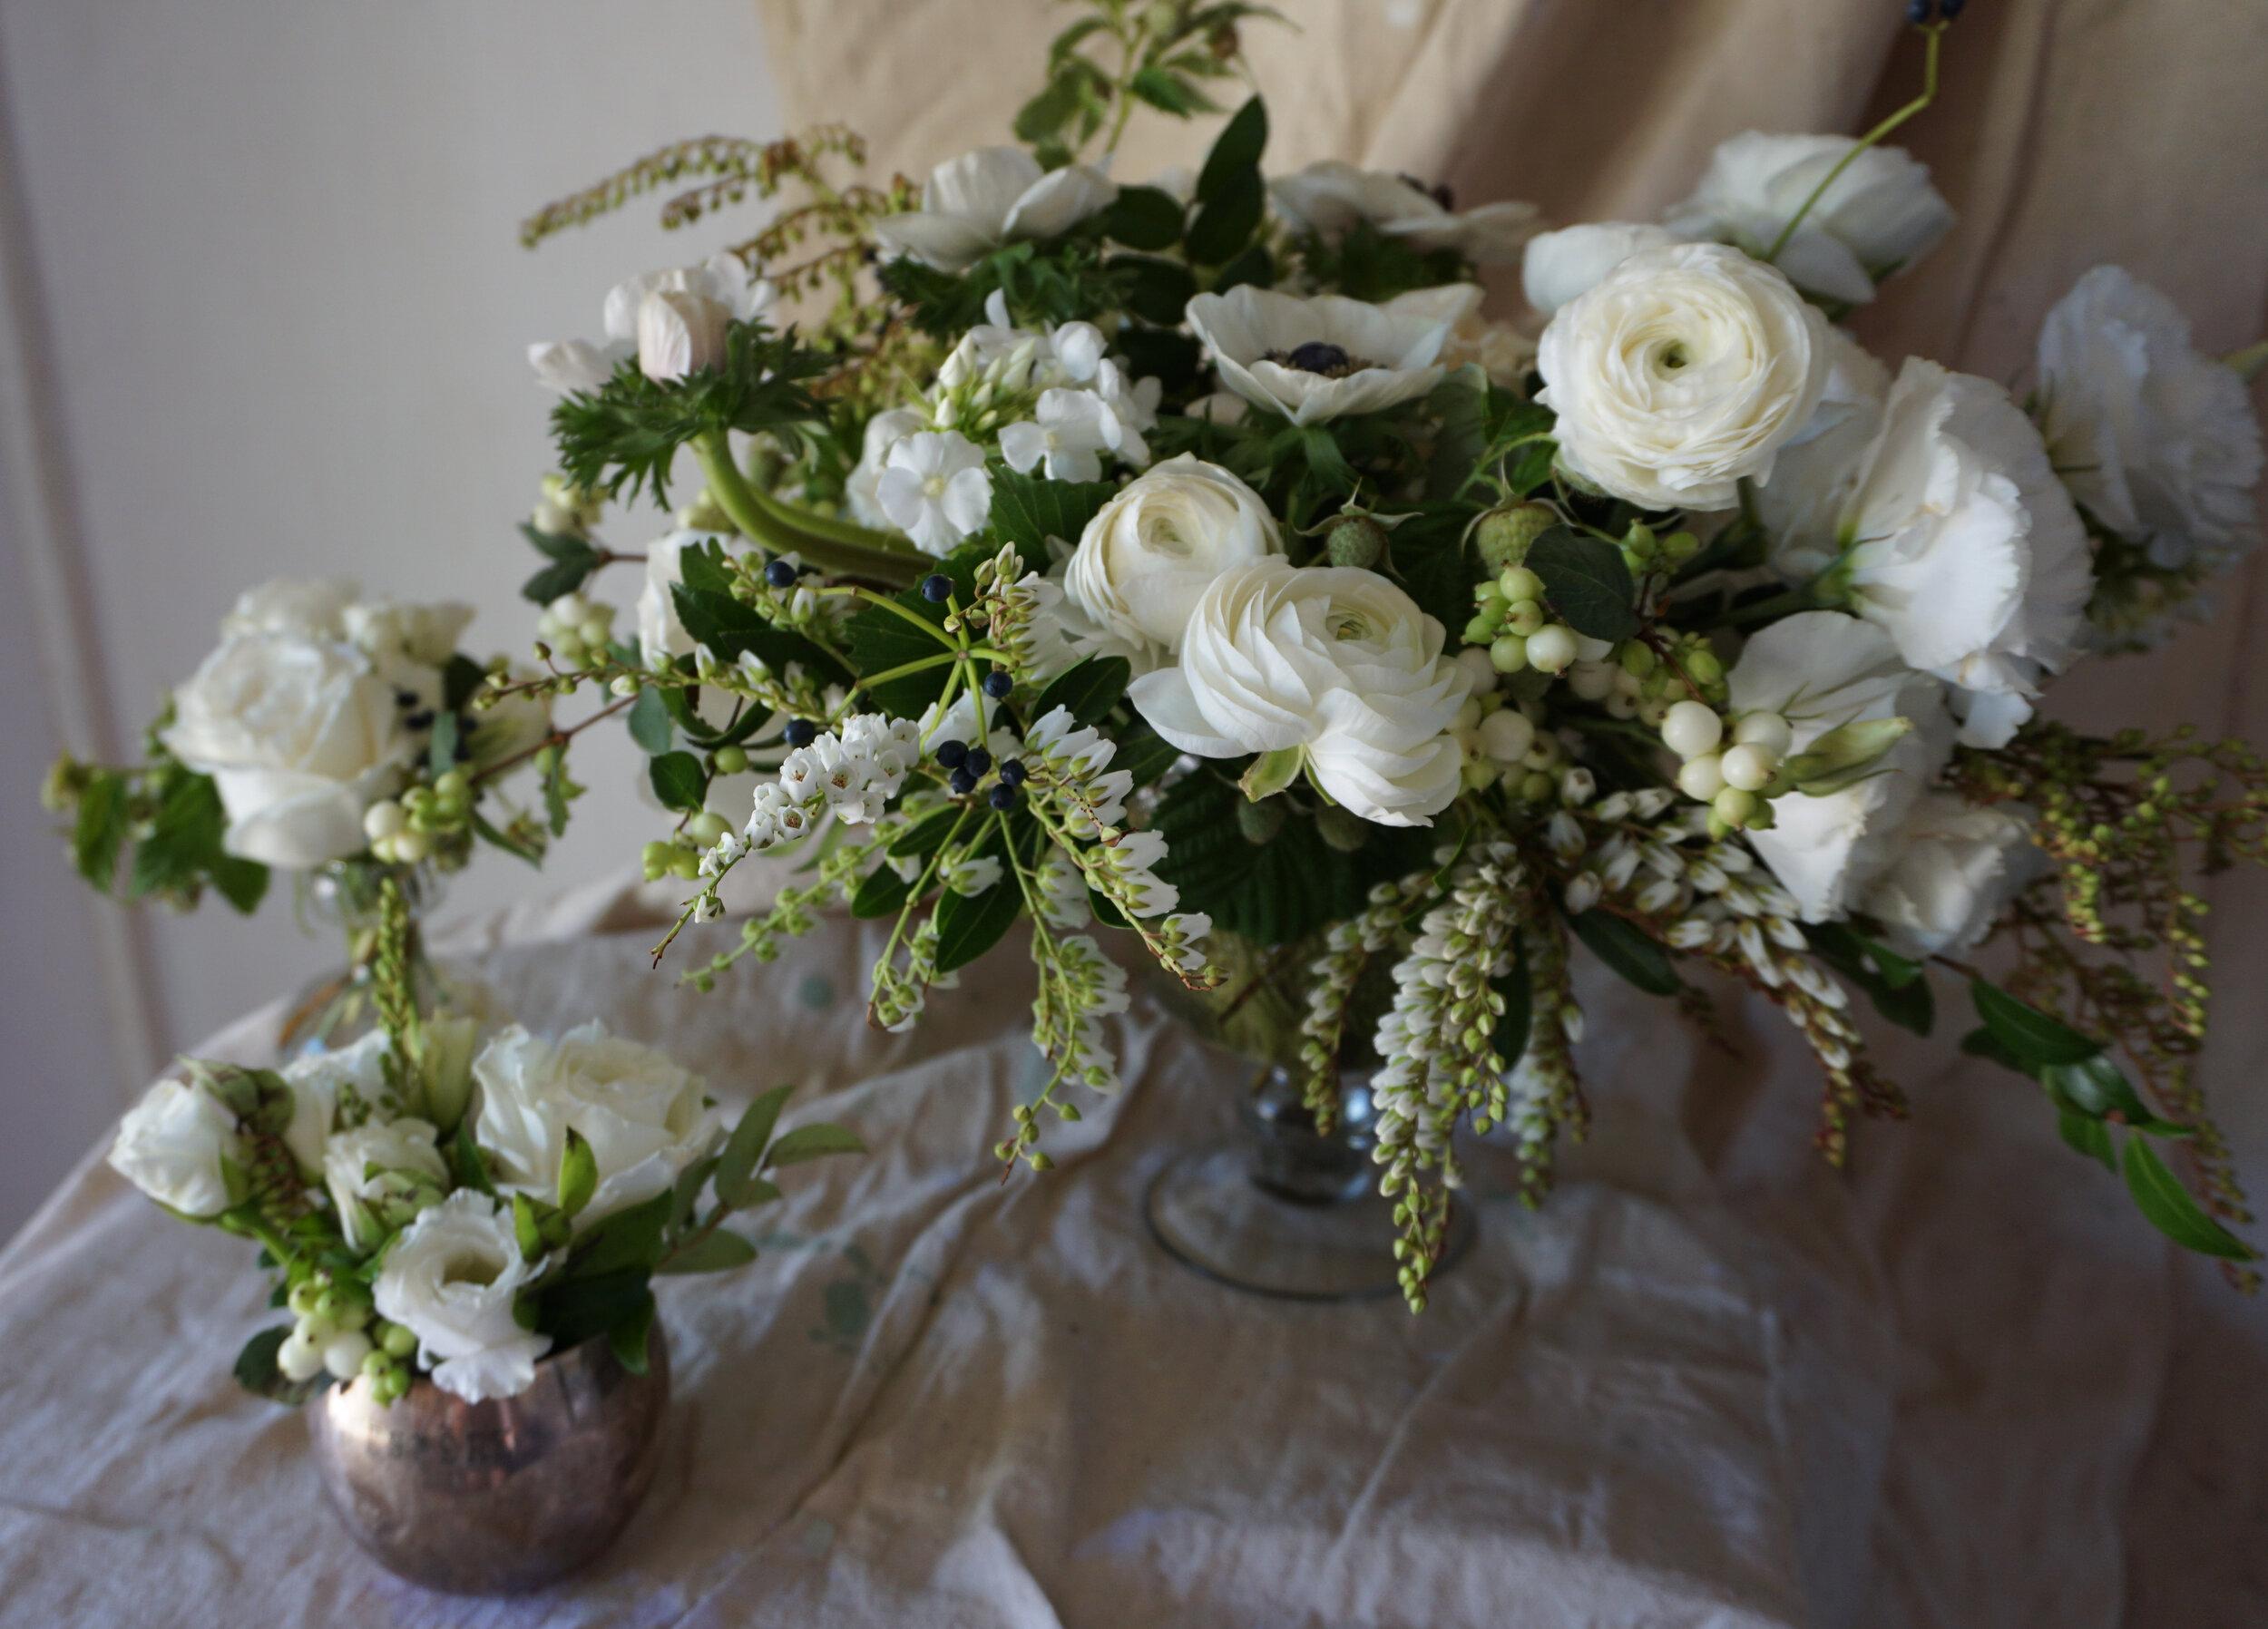 Botanicamuse by Madeleine Shelton Inn at Rancho Santa Fe San Diego Wedding event designer florist